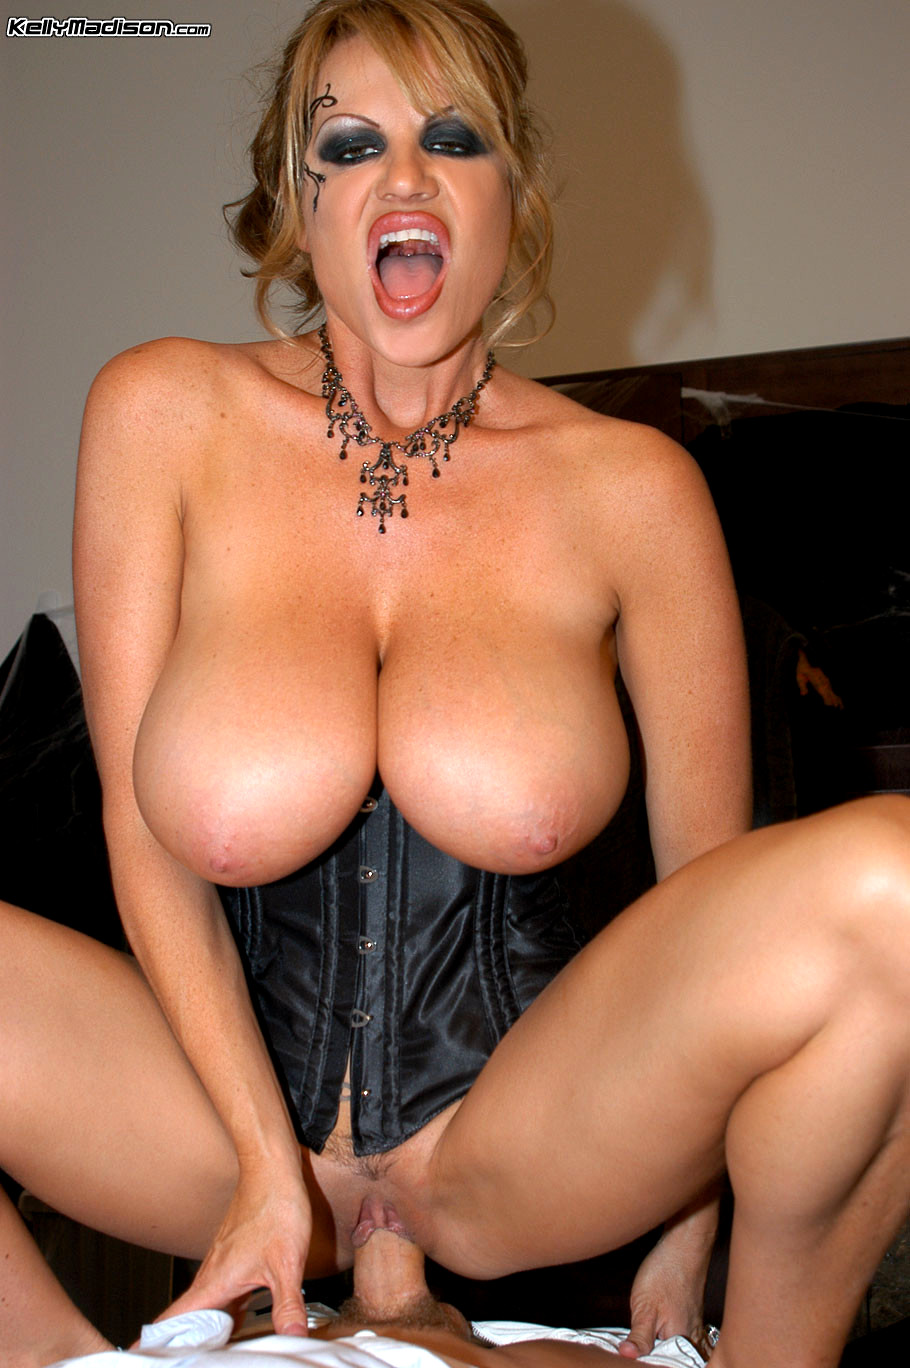 Kelly Madison Naked Pics